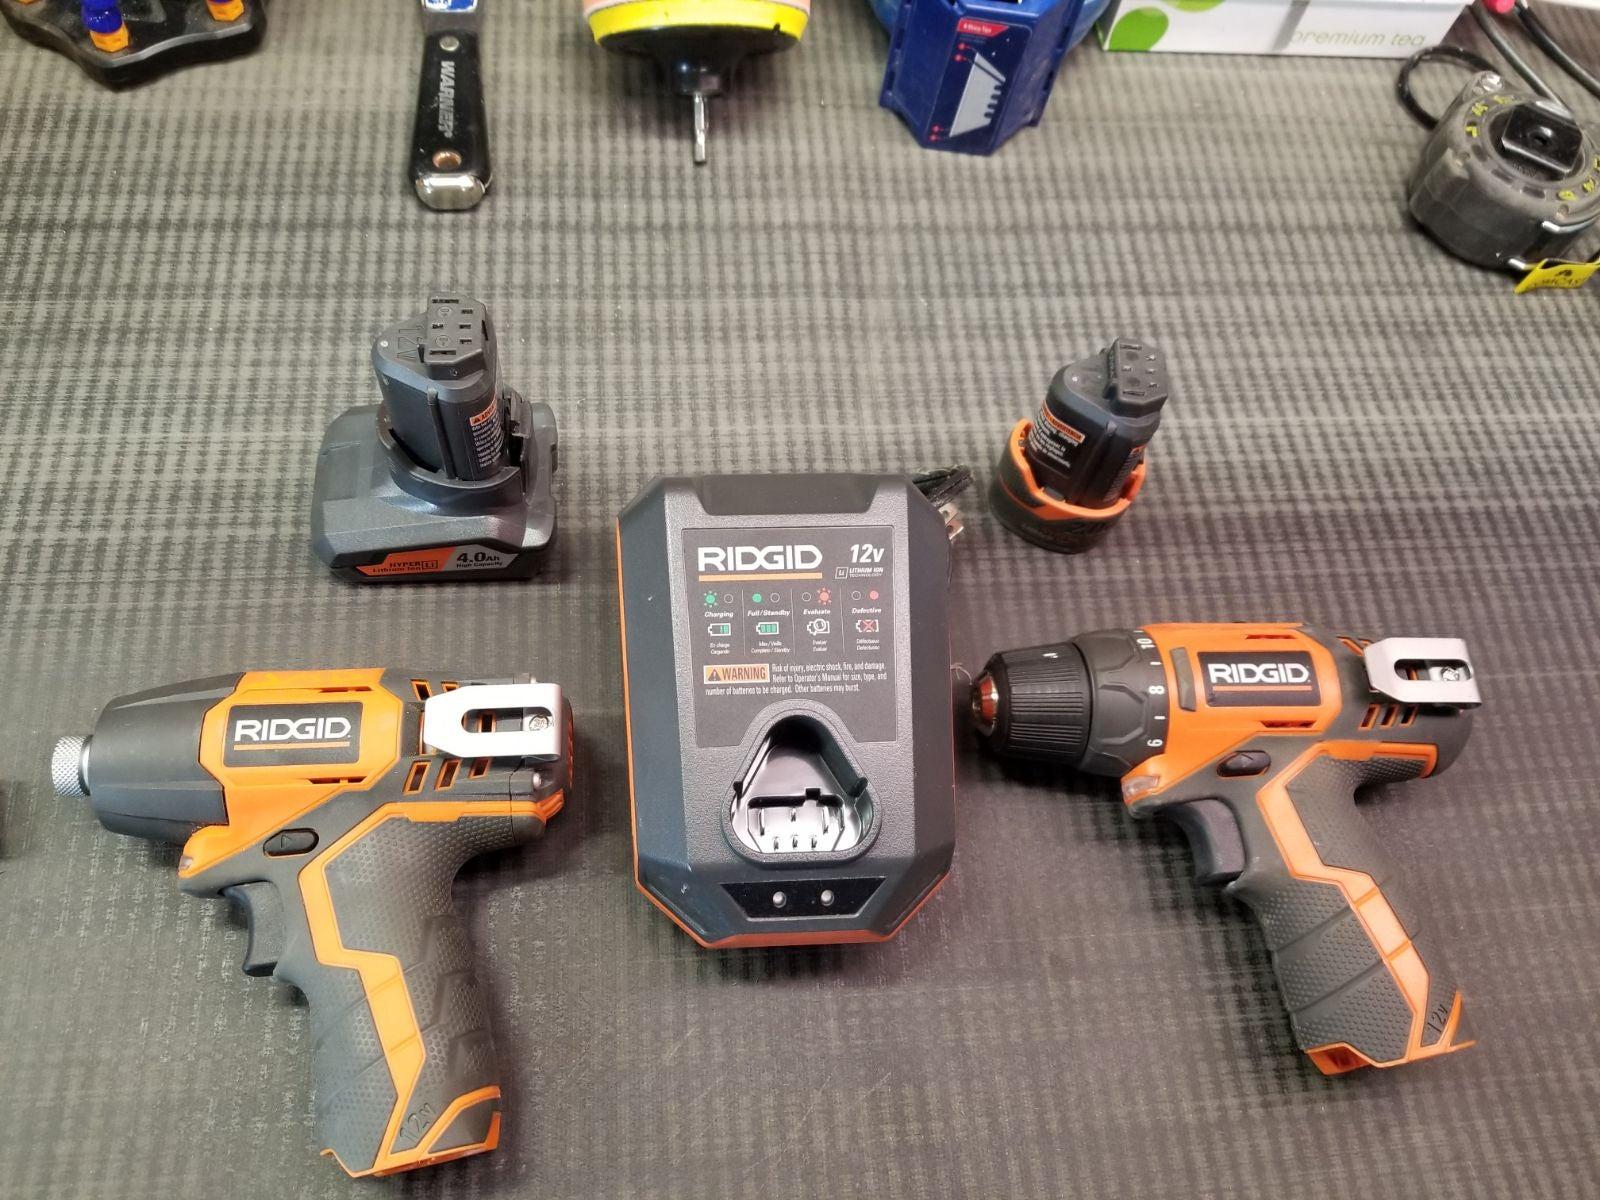 Ridgid 12V Drill and Impact Driver Kit